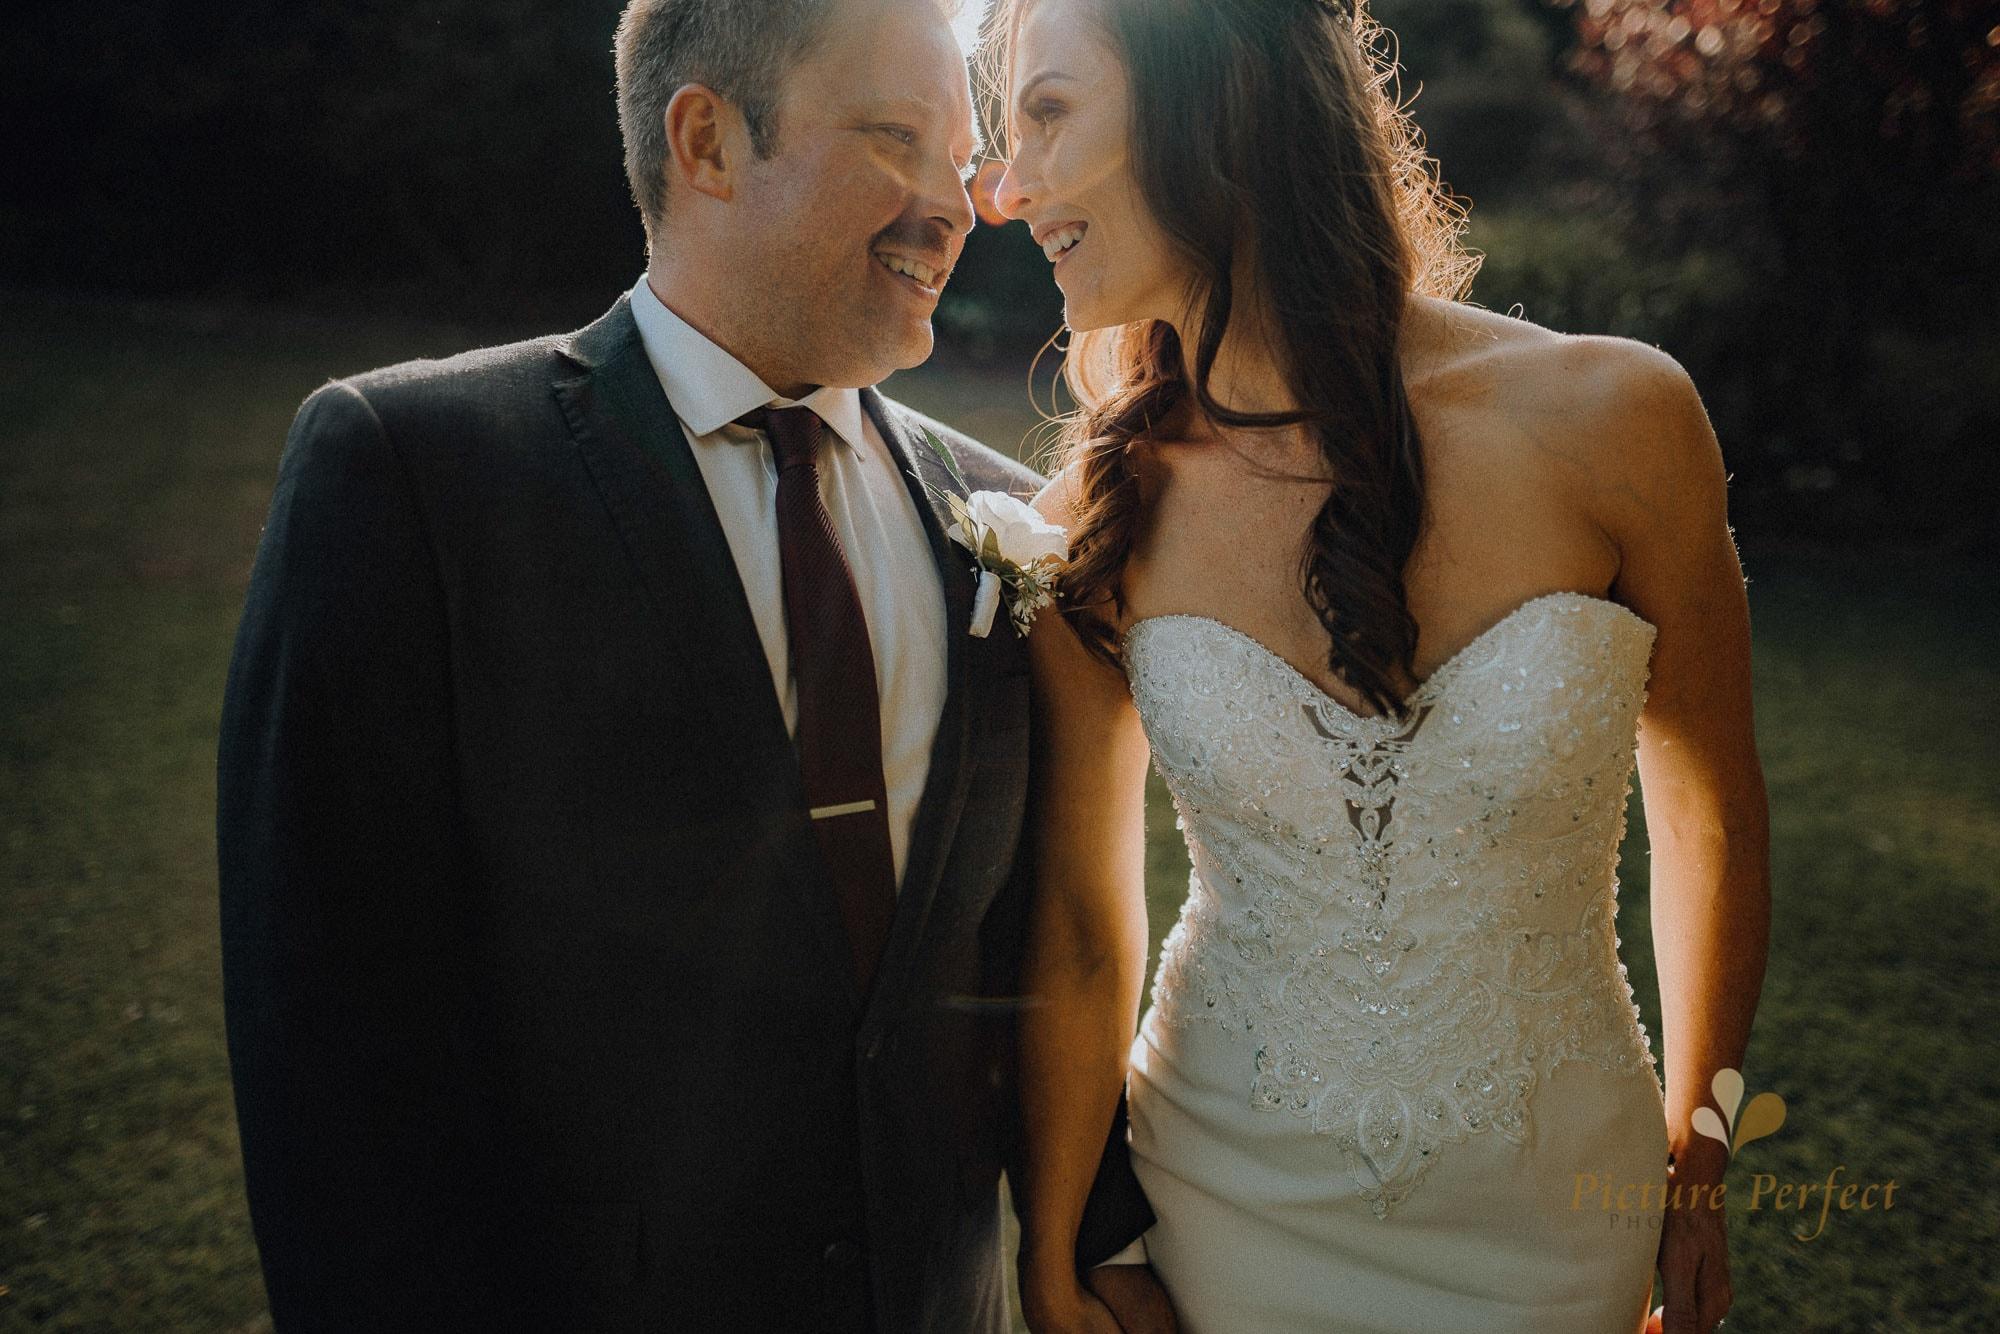 Roseburb Park wedding of Casey 4758